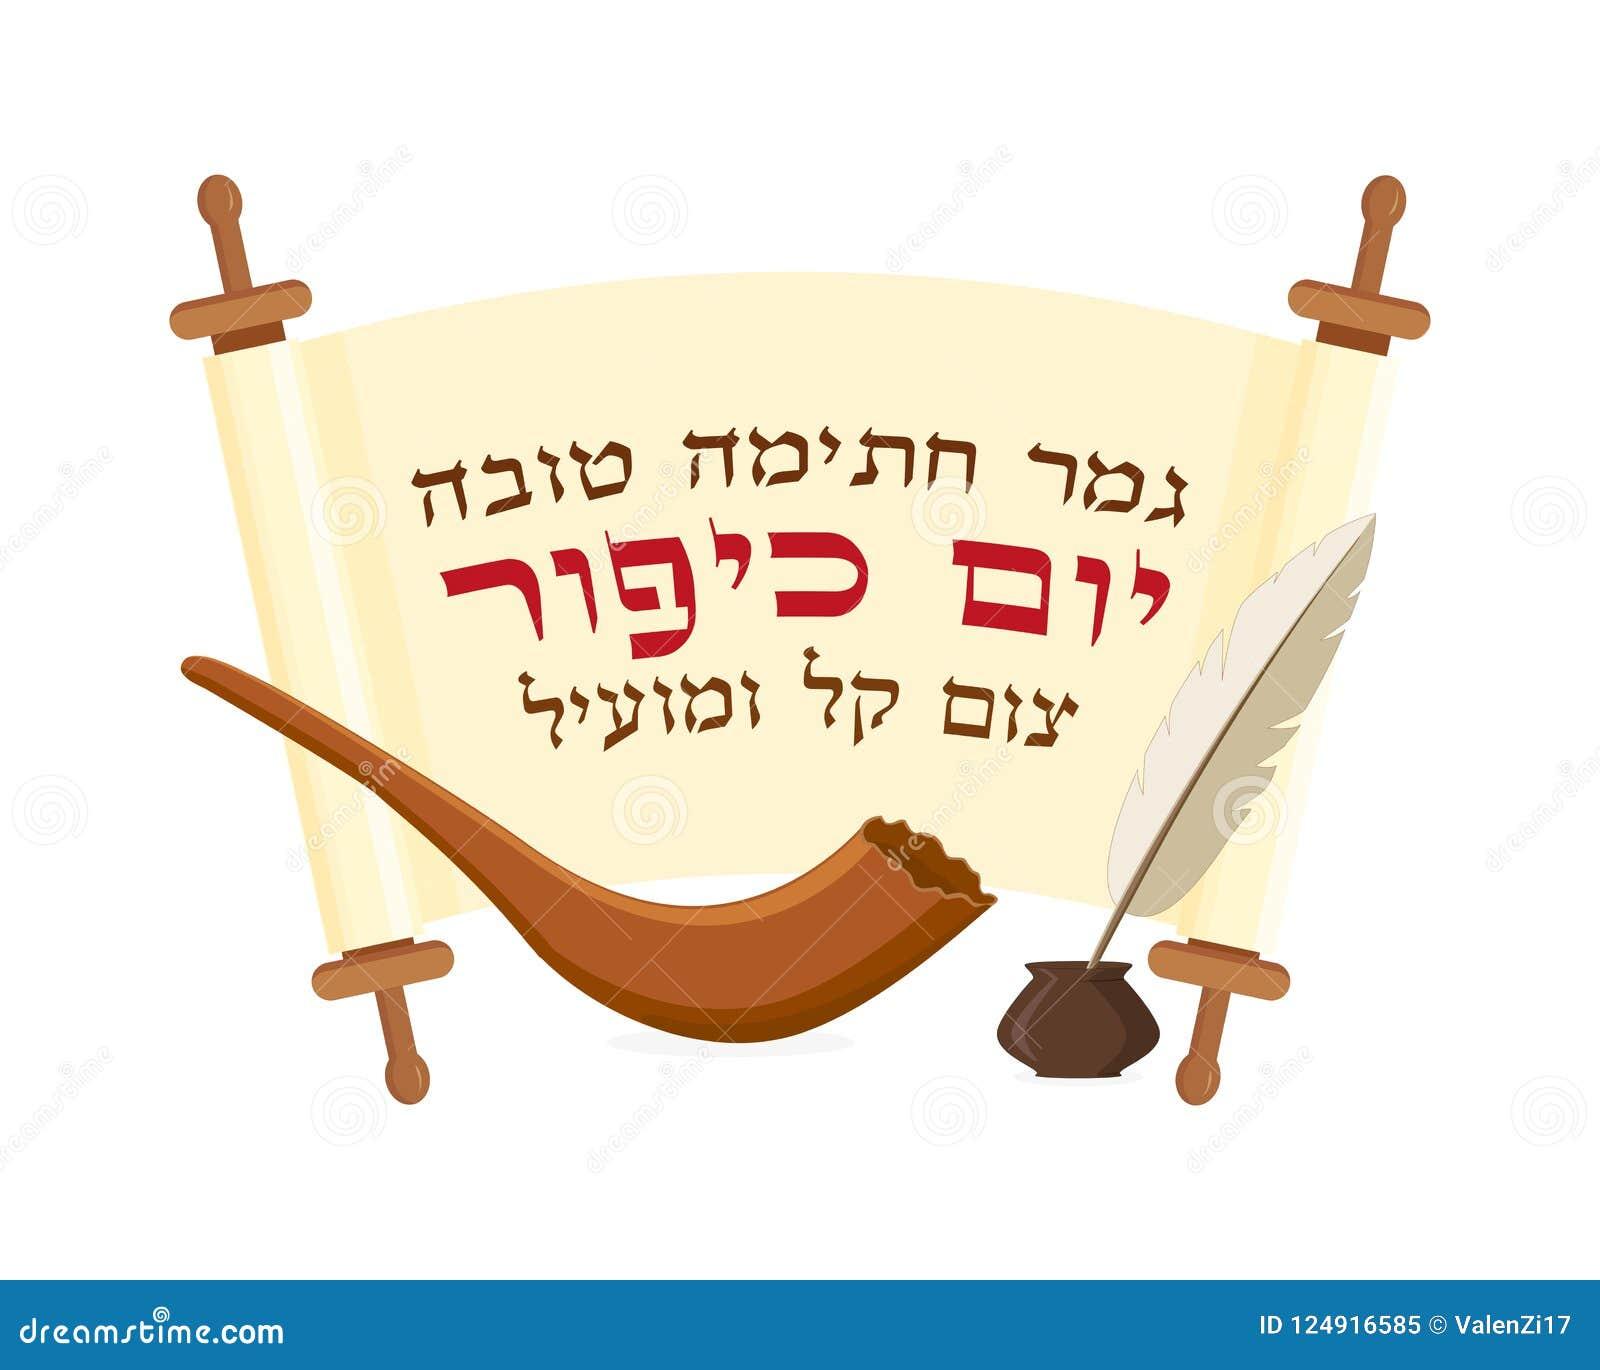 Scroll with jewish greeting for yom kippur stock illustration download scroll with jewish greeting for yom kippur stock illustration illustration of judaica hebrew m4hsunfo